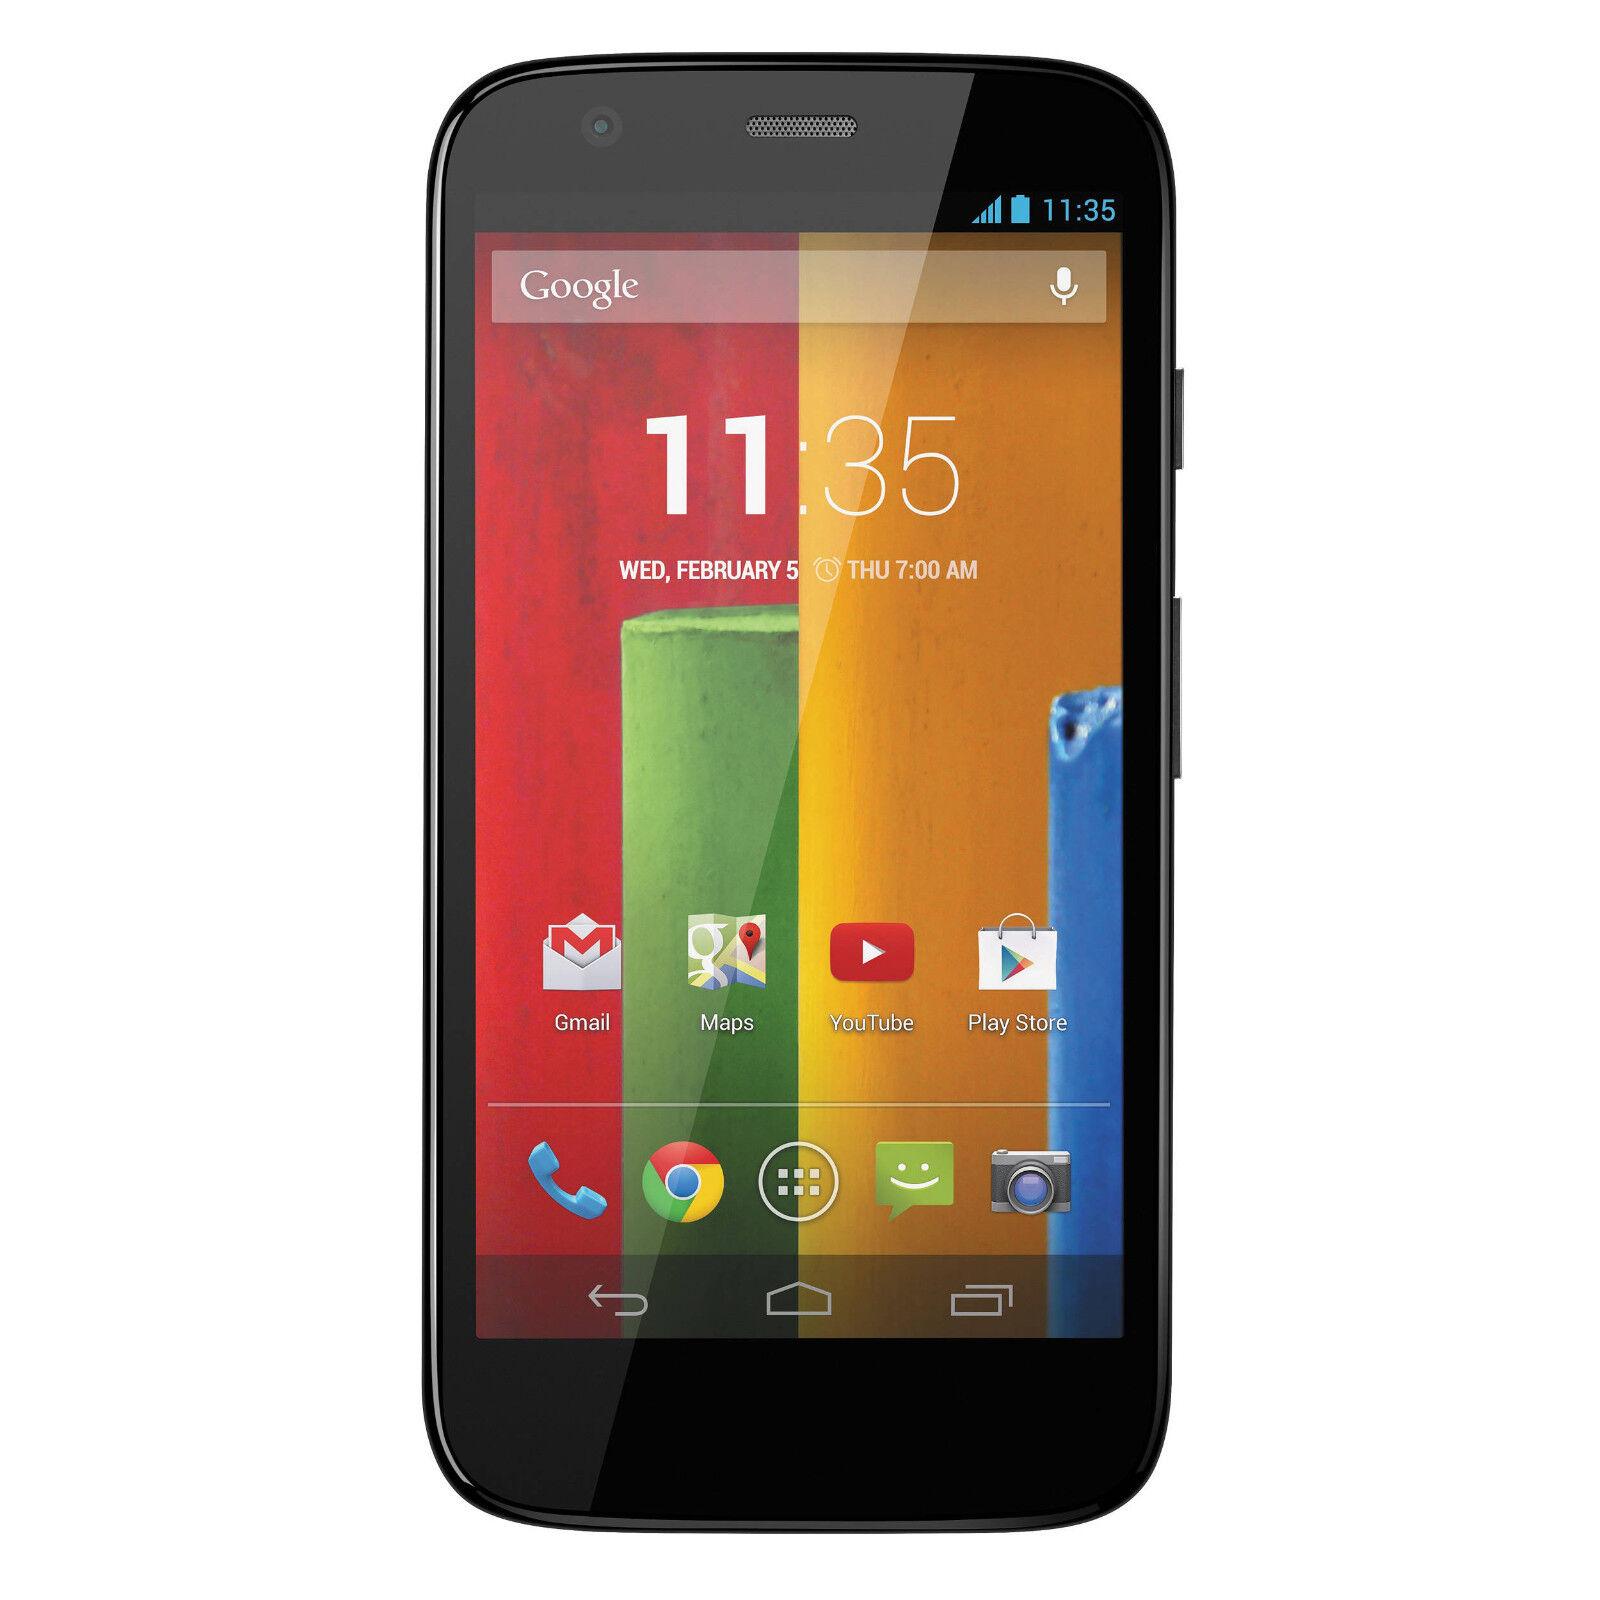 MOTOROLA MOTO G XT-1032 8GB / 16GB - Unlocked - MULTI LISTING! - Smartphone